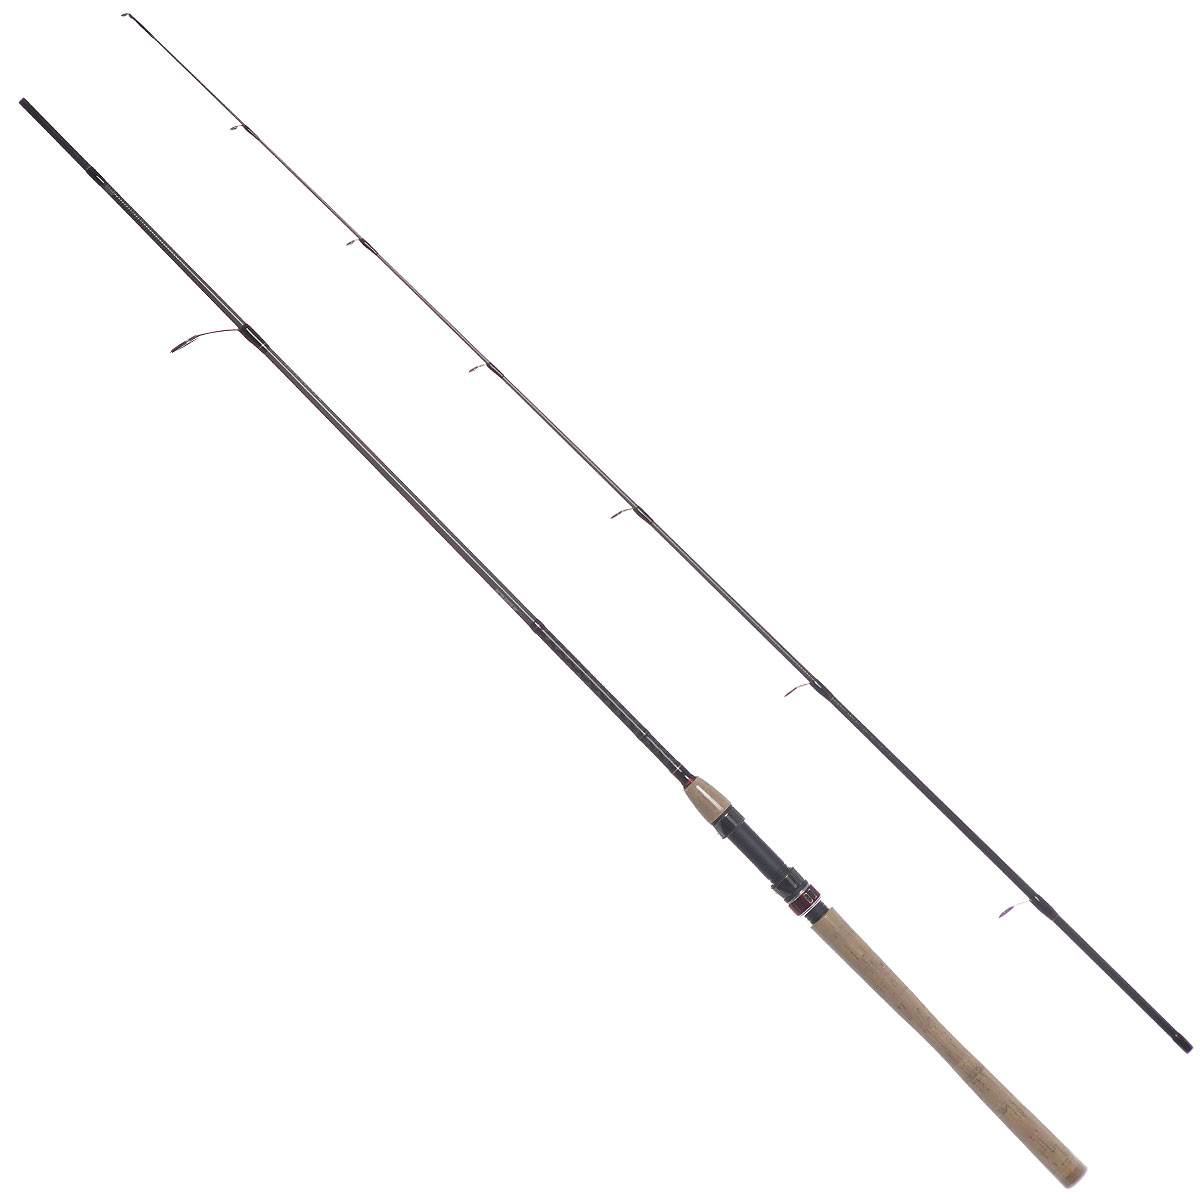 Спиннинг штекерный Daiwa Procaster Spinning, 2,10 м, 10-30 г